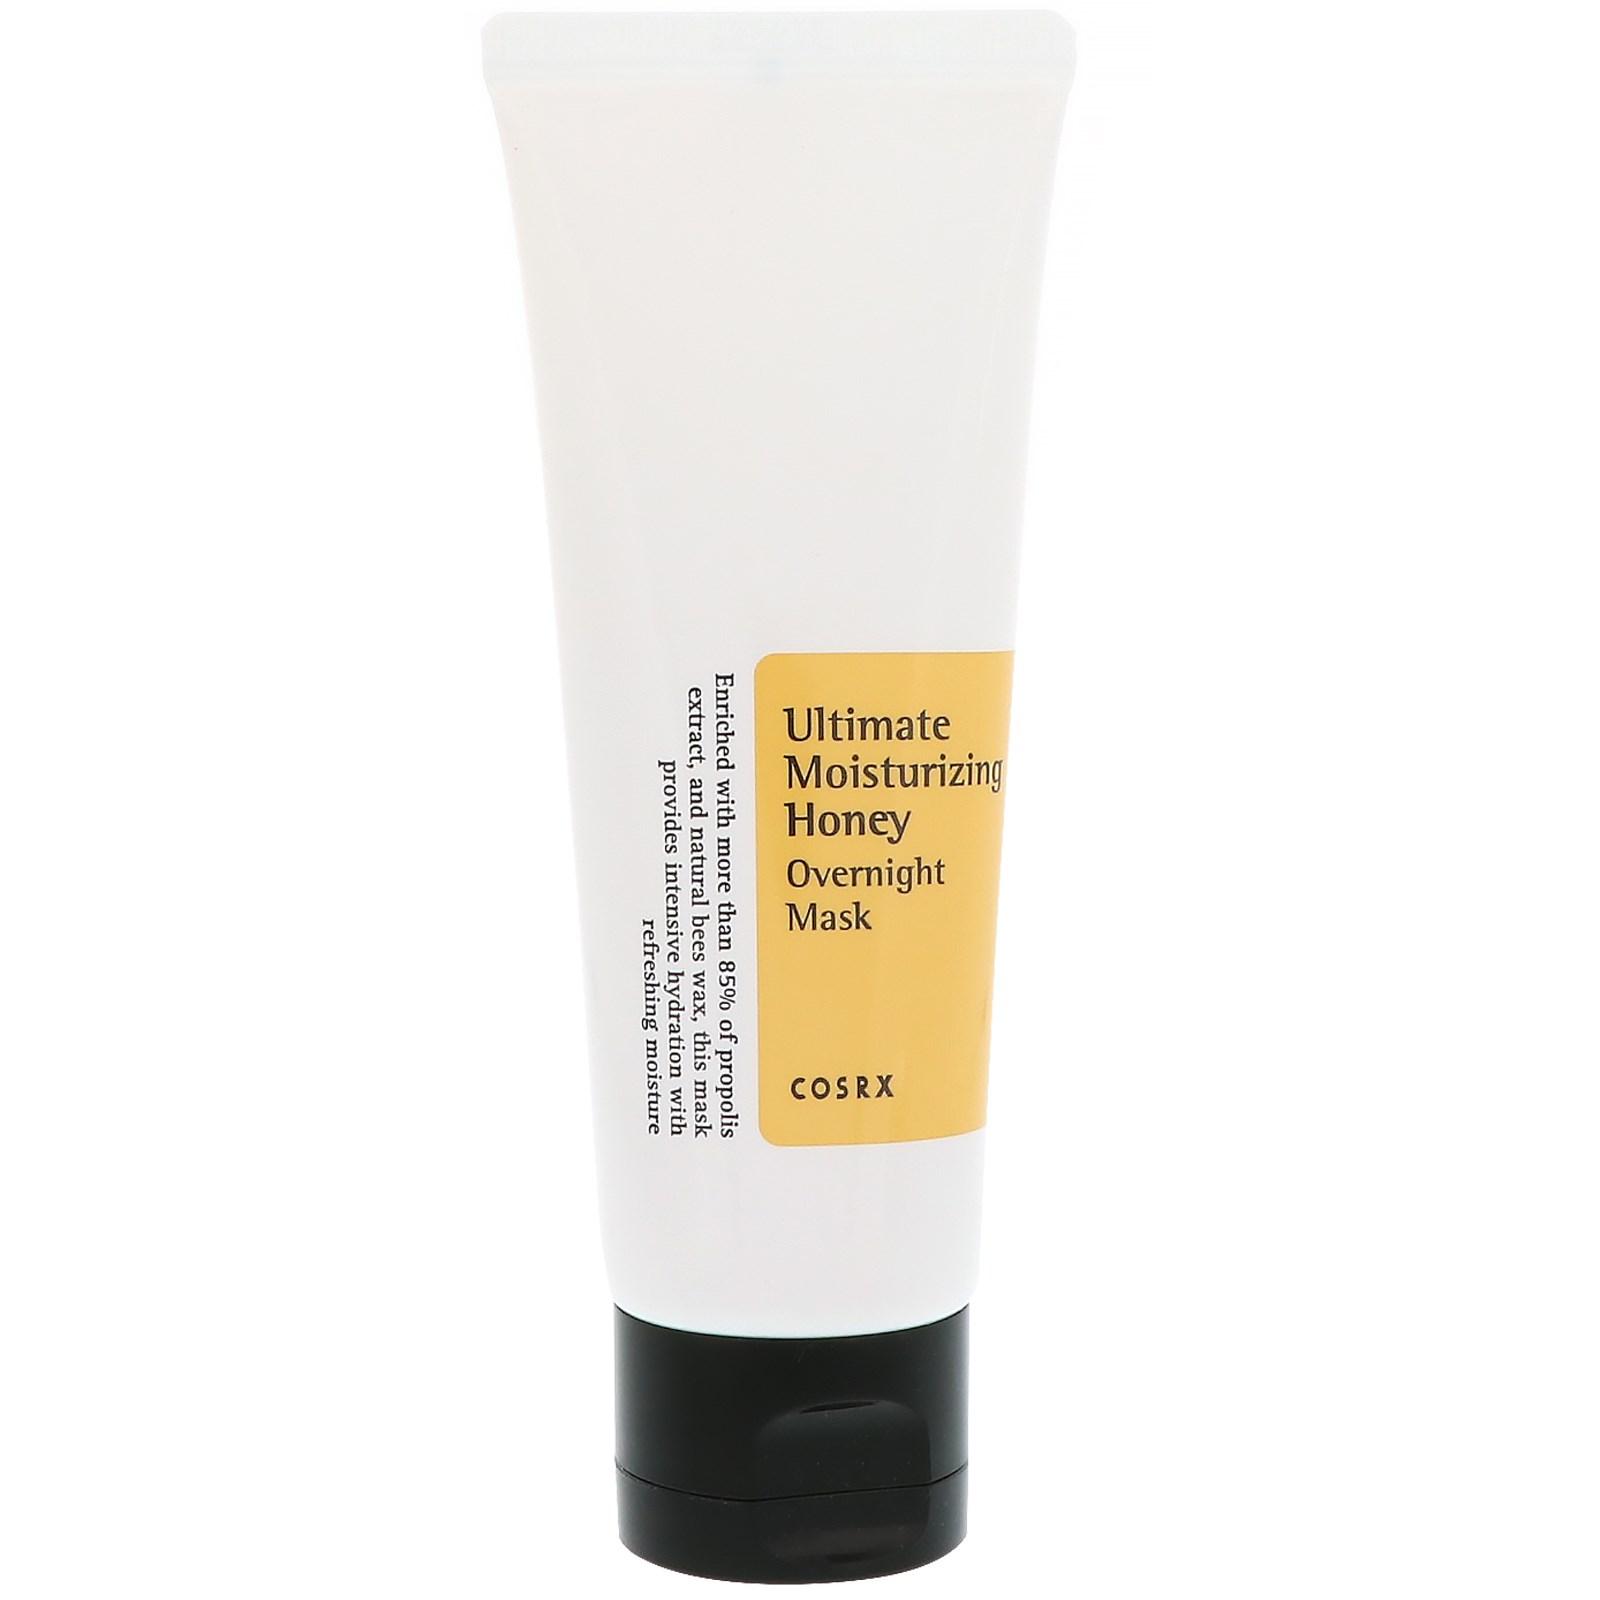 Cosrx, Ultimate Moisturizing Honey, Overnight Mask, 2.02 fl oz (60 ml)